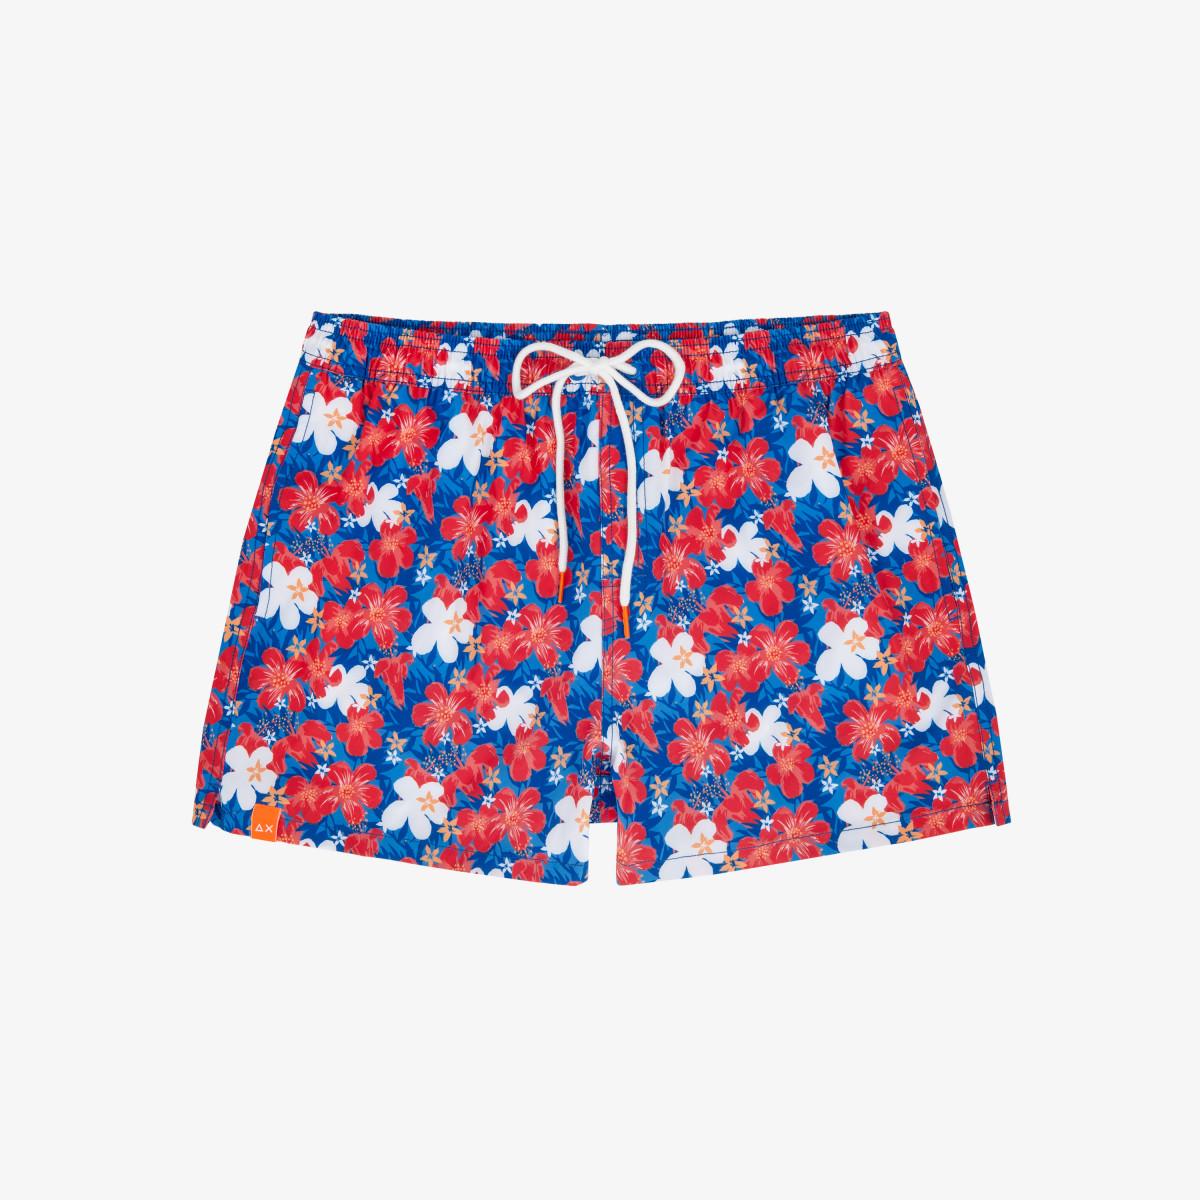 SWIM PANT HAWAII & FLOWERS BLUE/RED